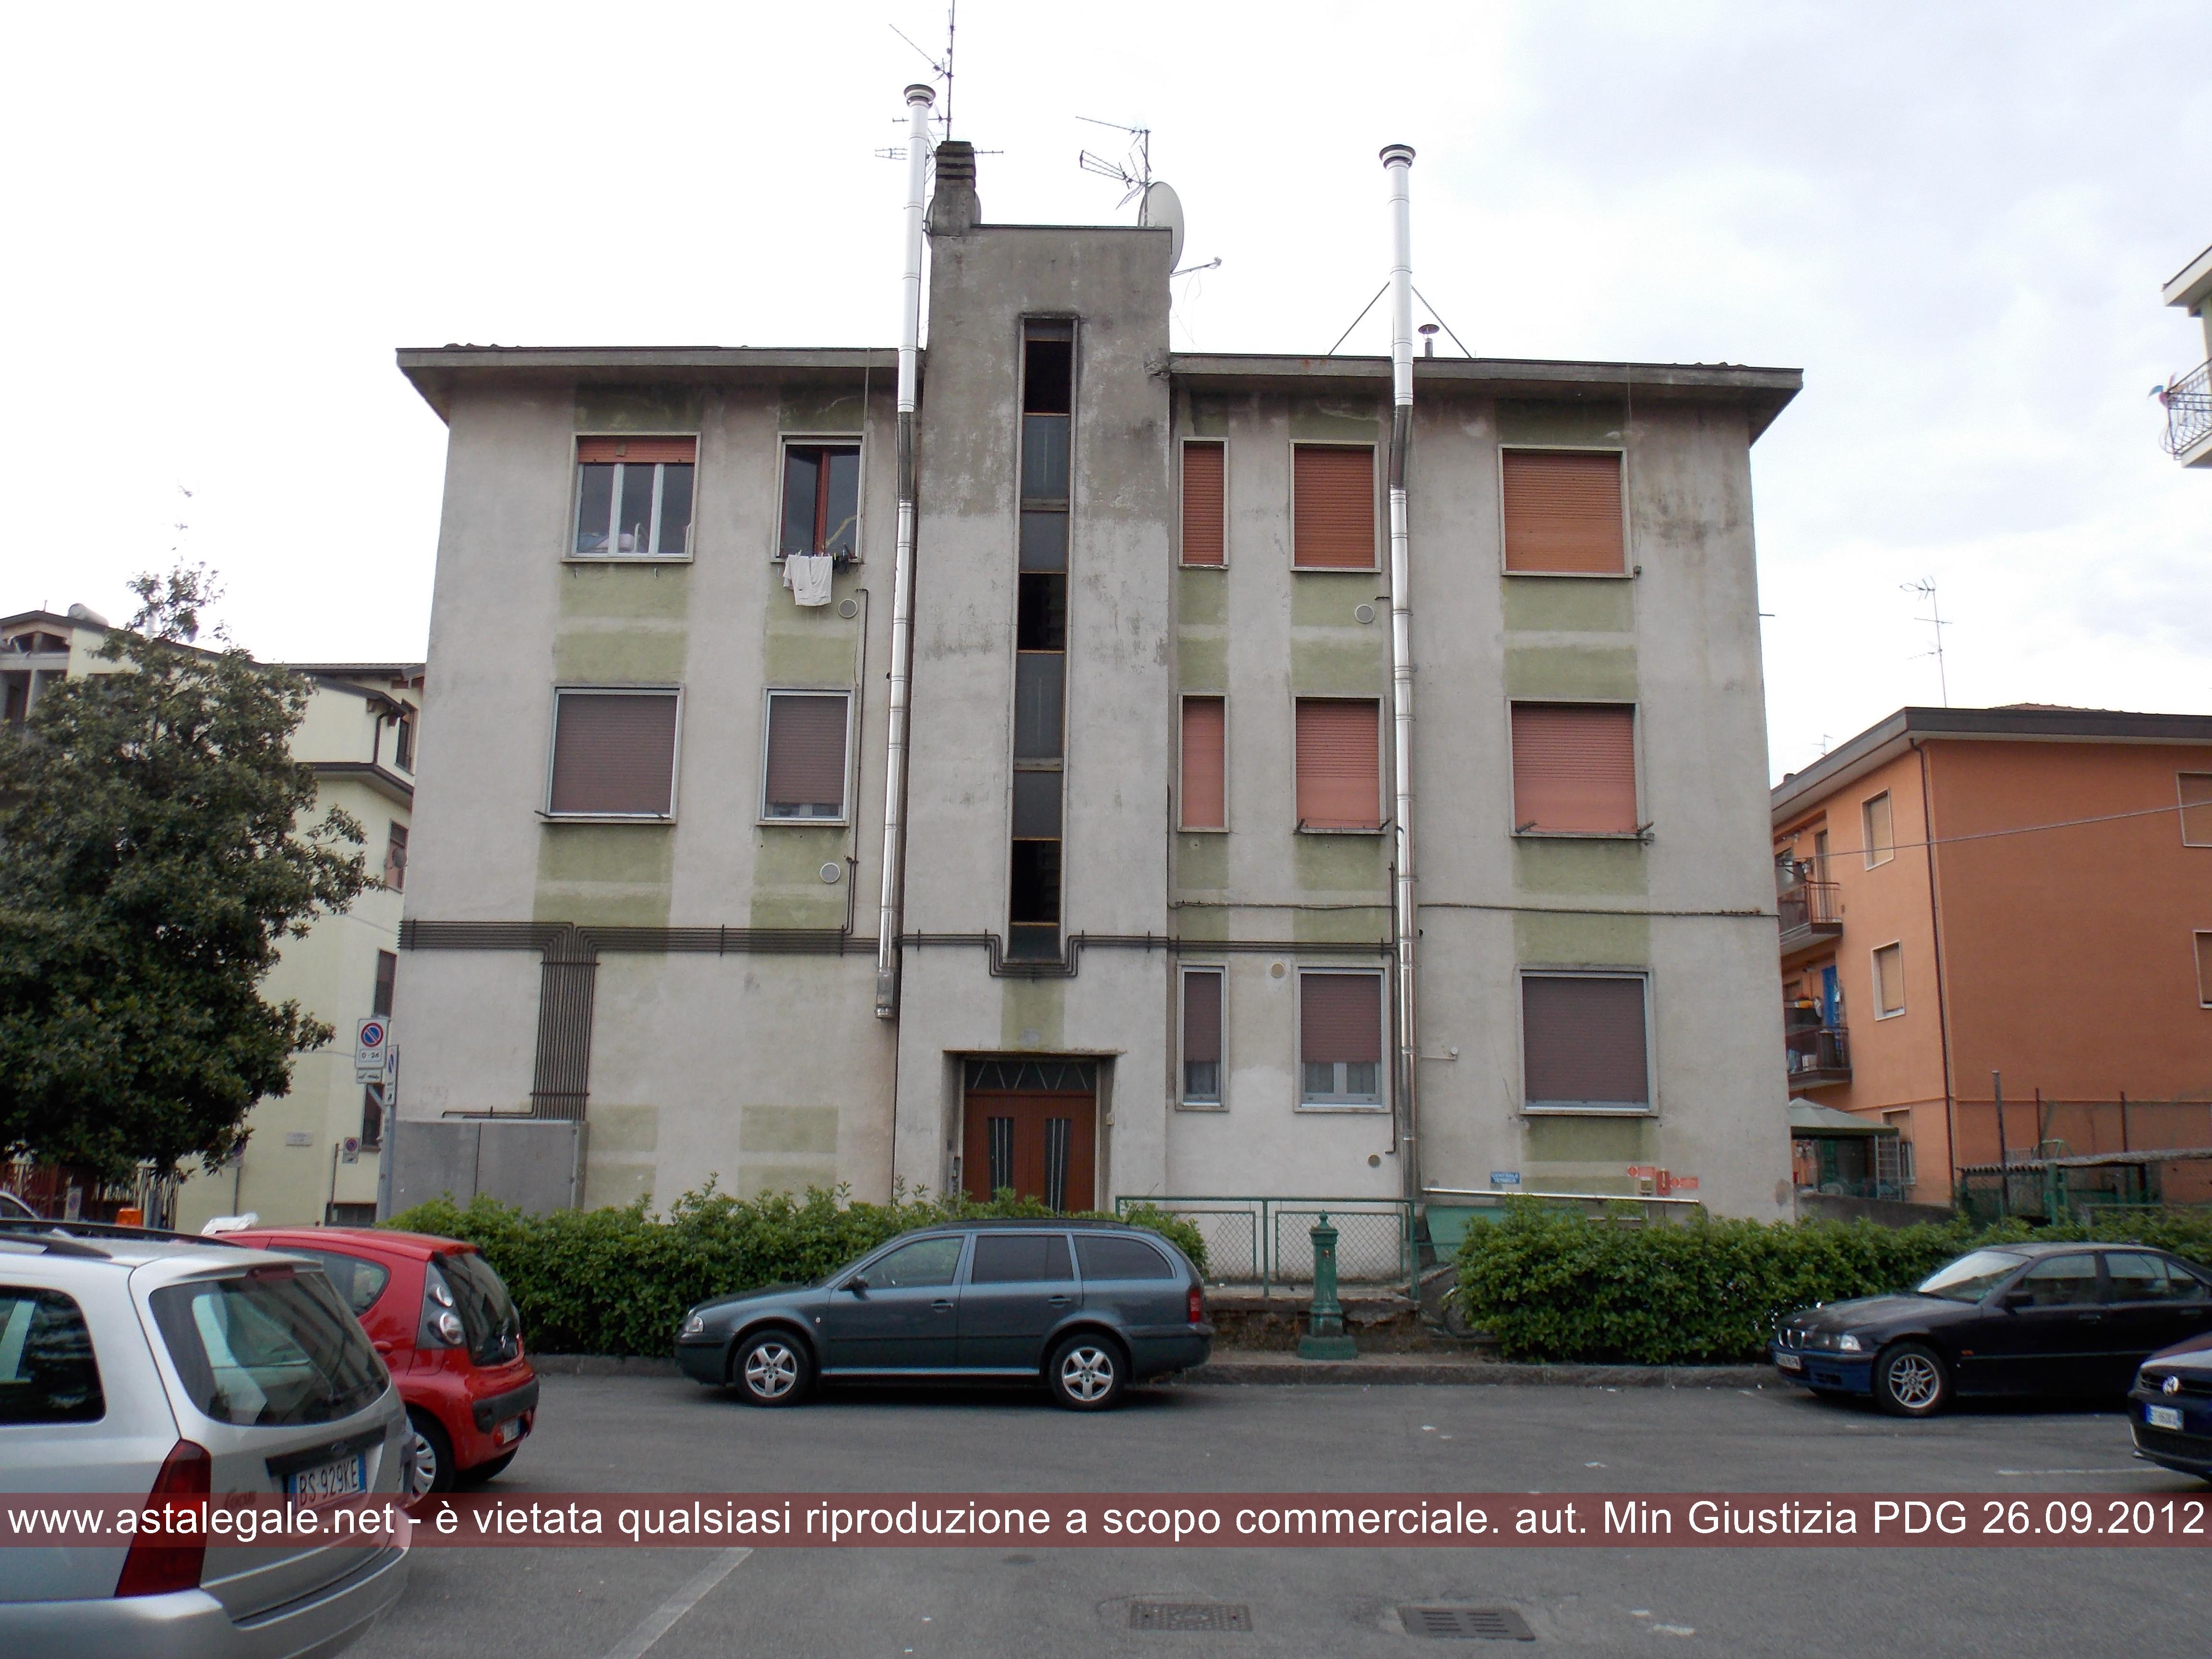 San Giuliano Milanese (MI) Via Giosuè Carducci 30